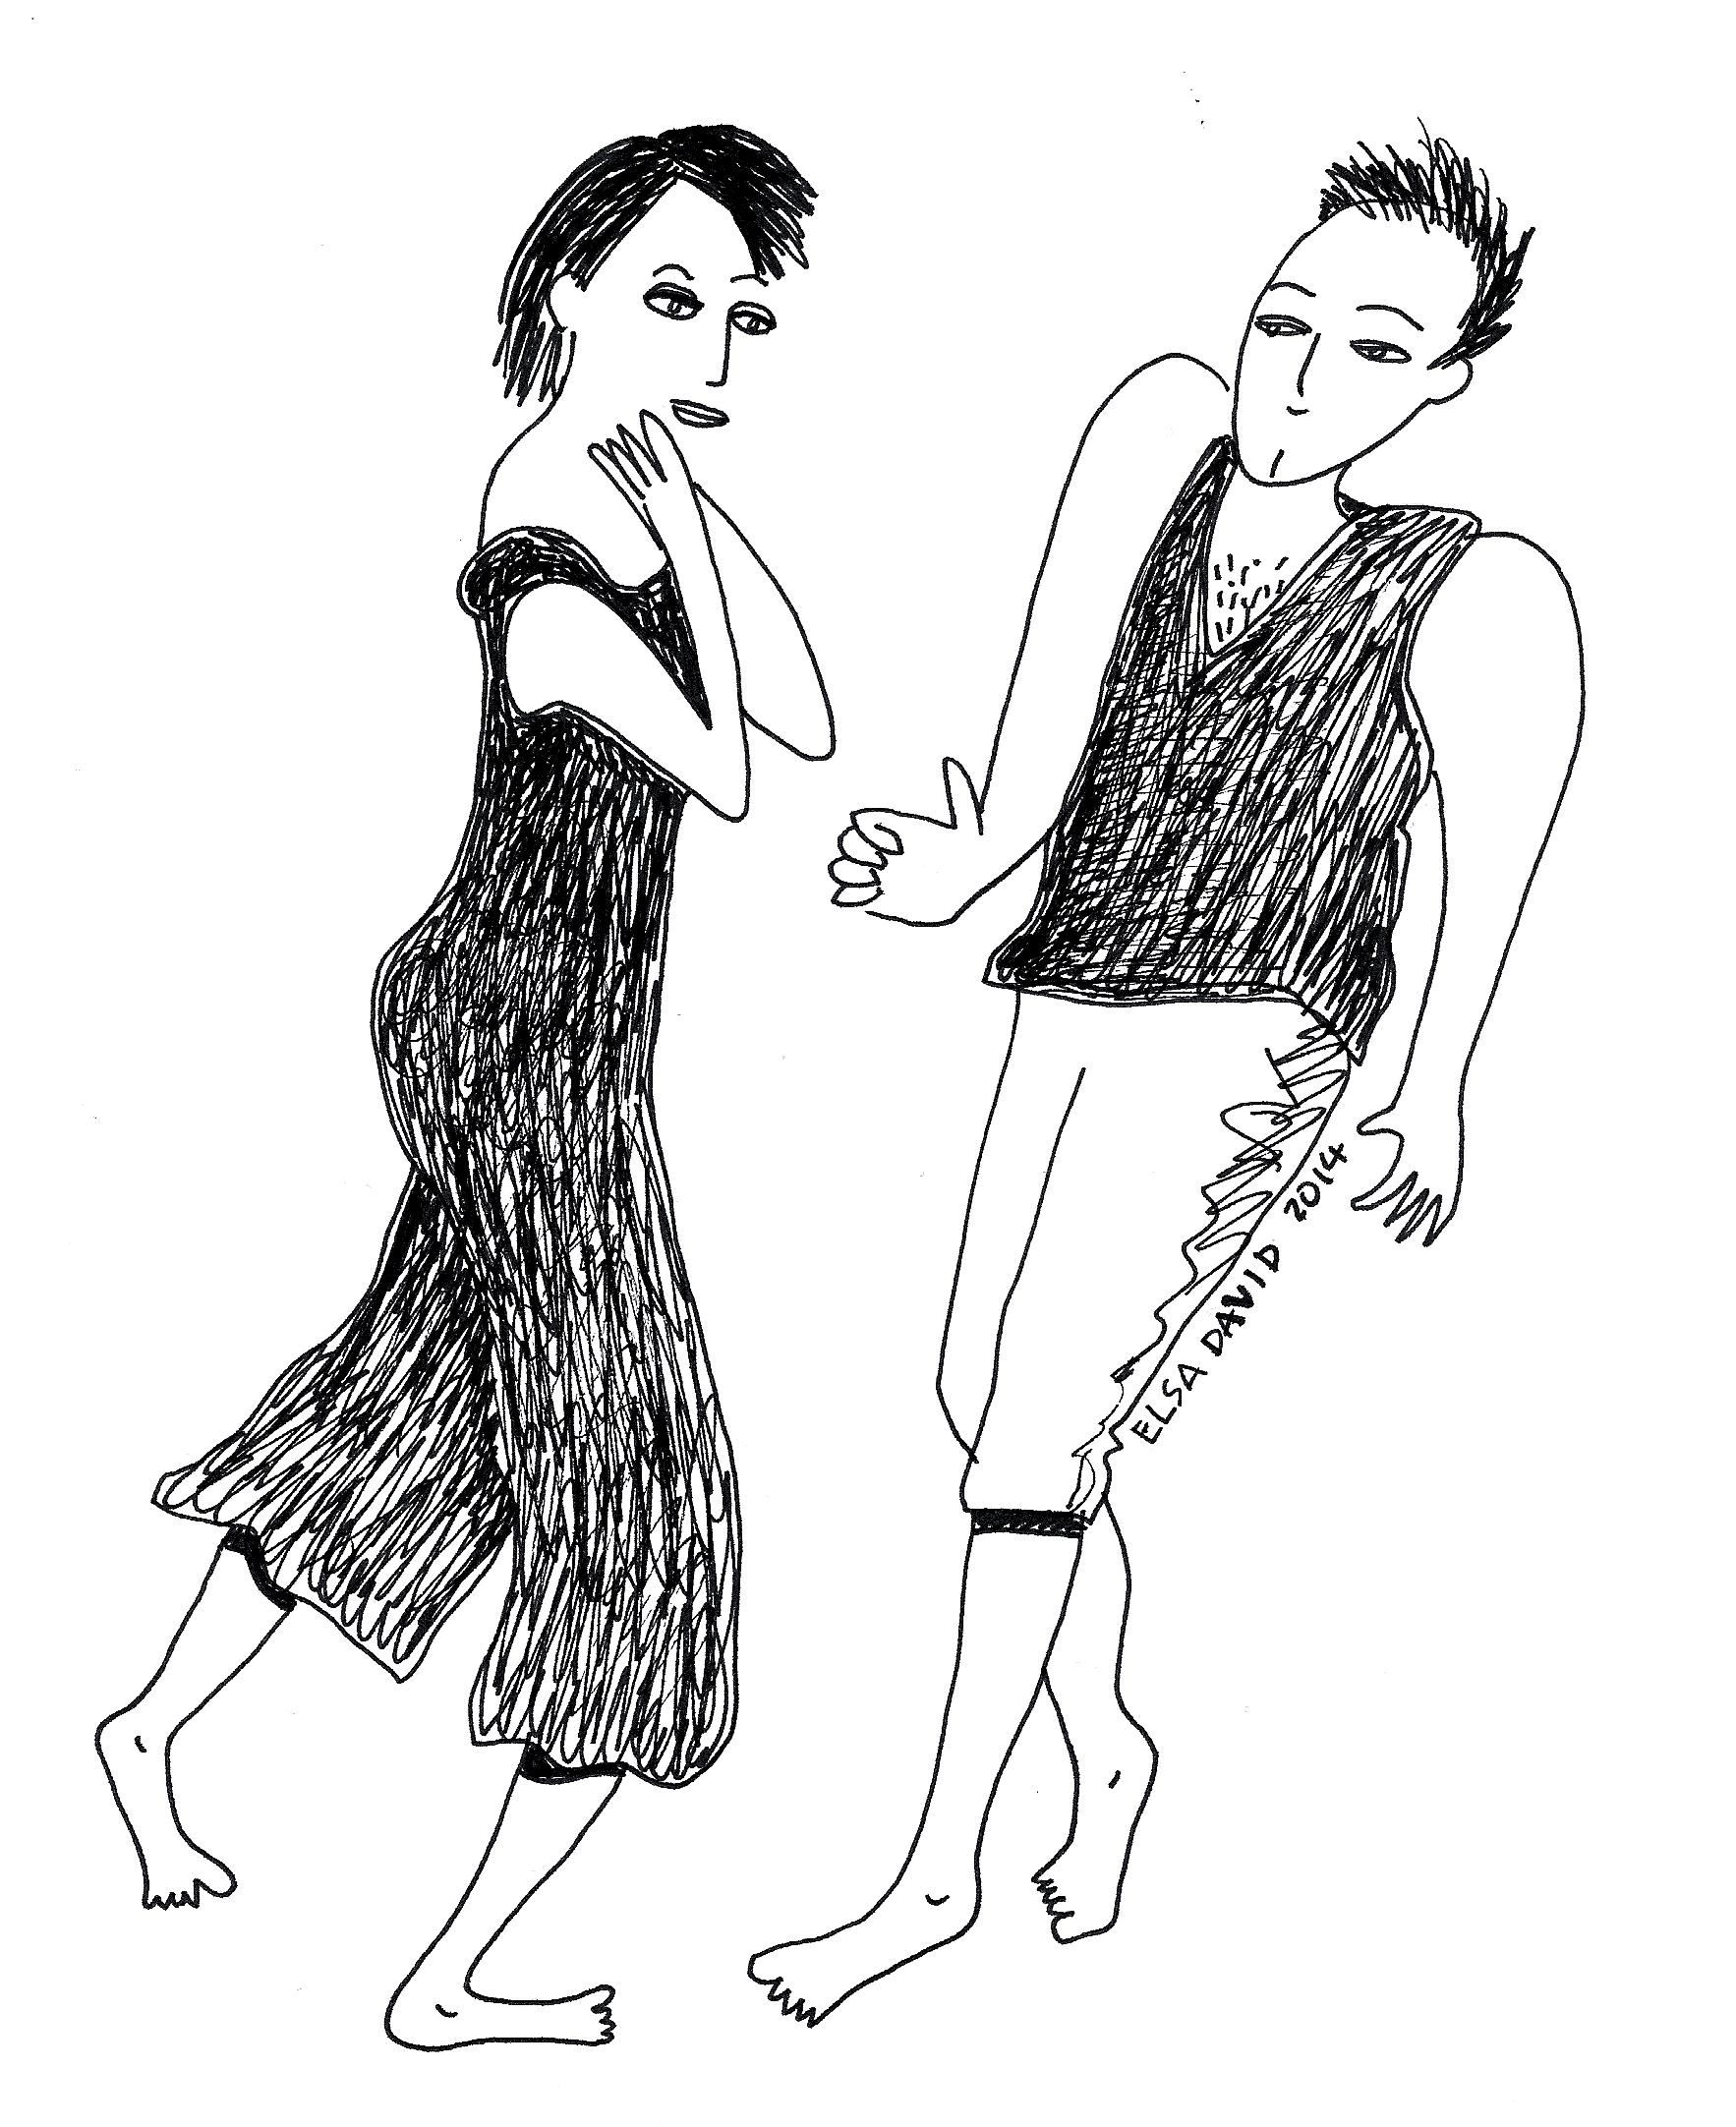 danca-de-seducao.png